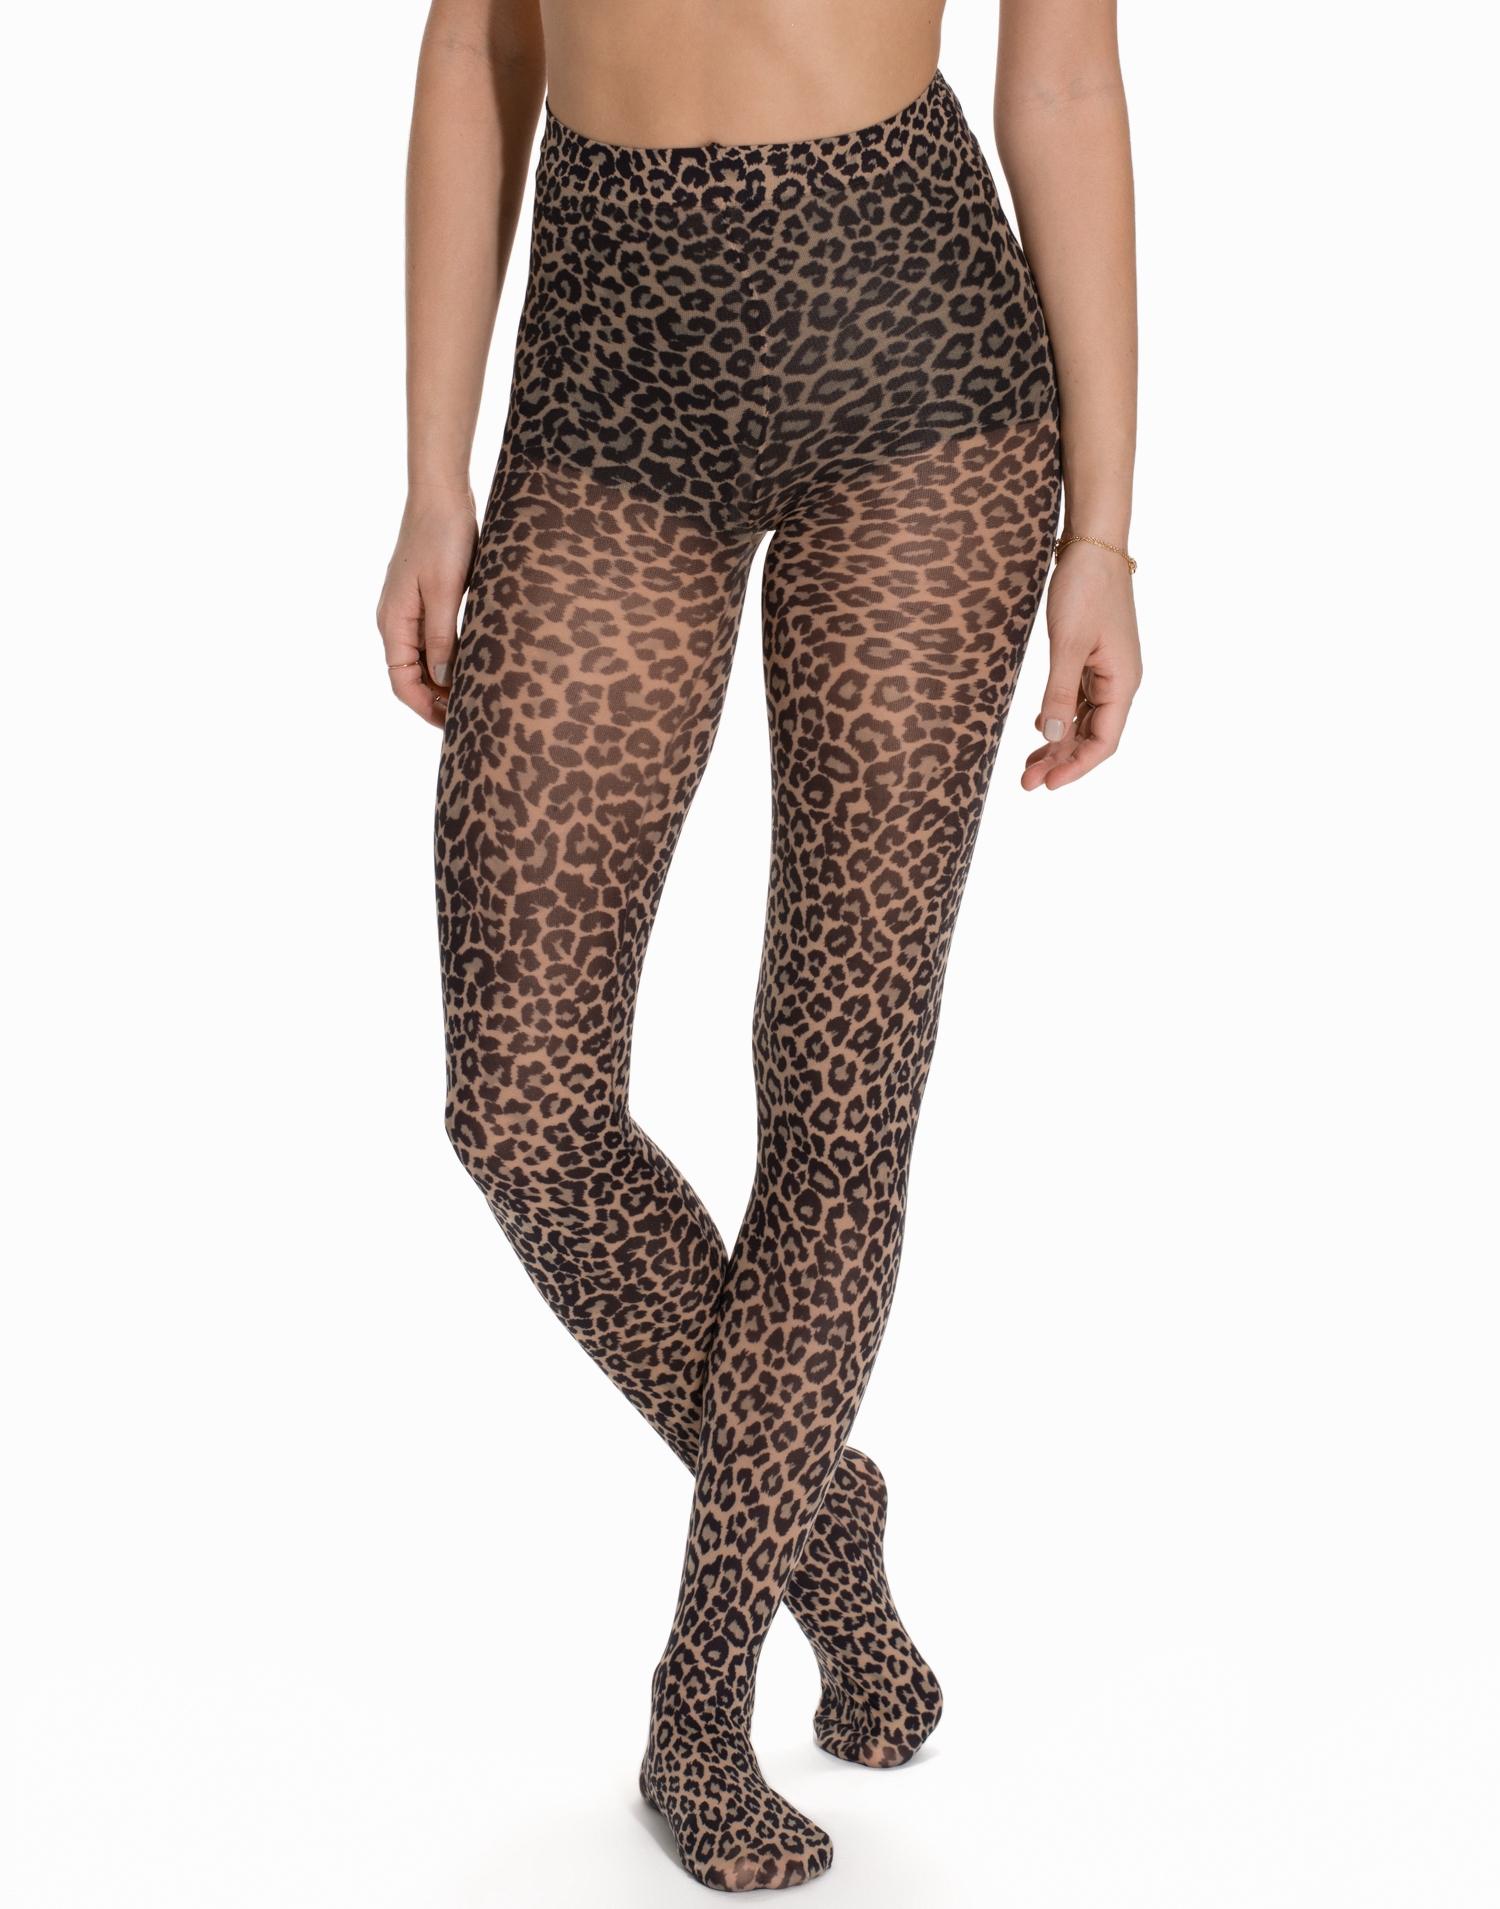 Pamela Mann Small Leopard Tights Strumpbyxor Leopard